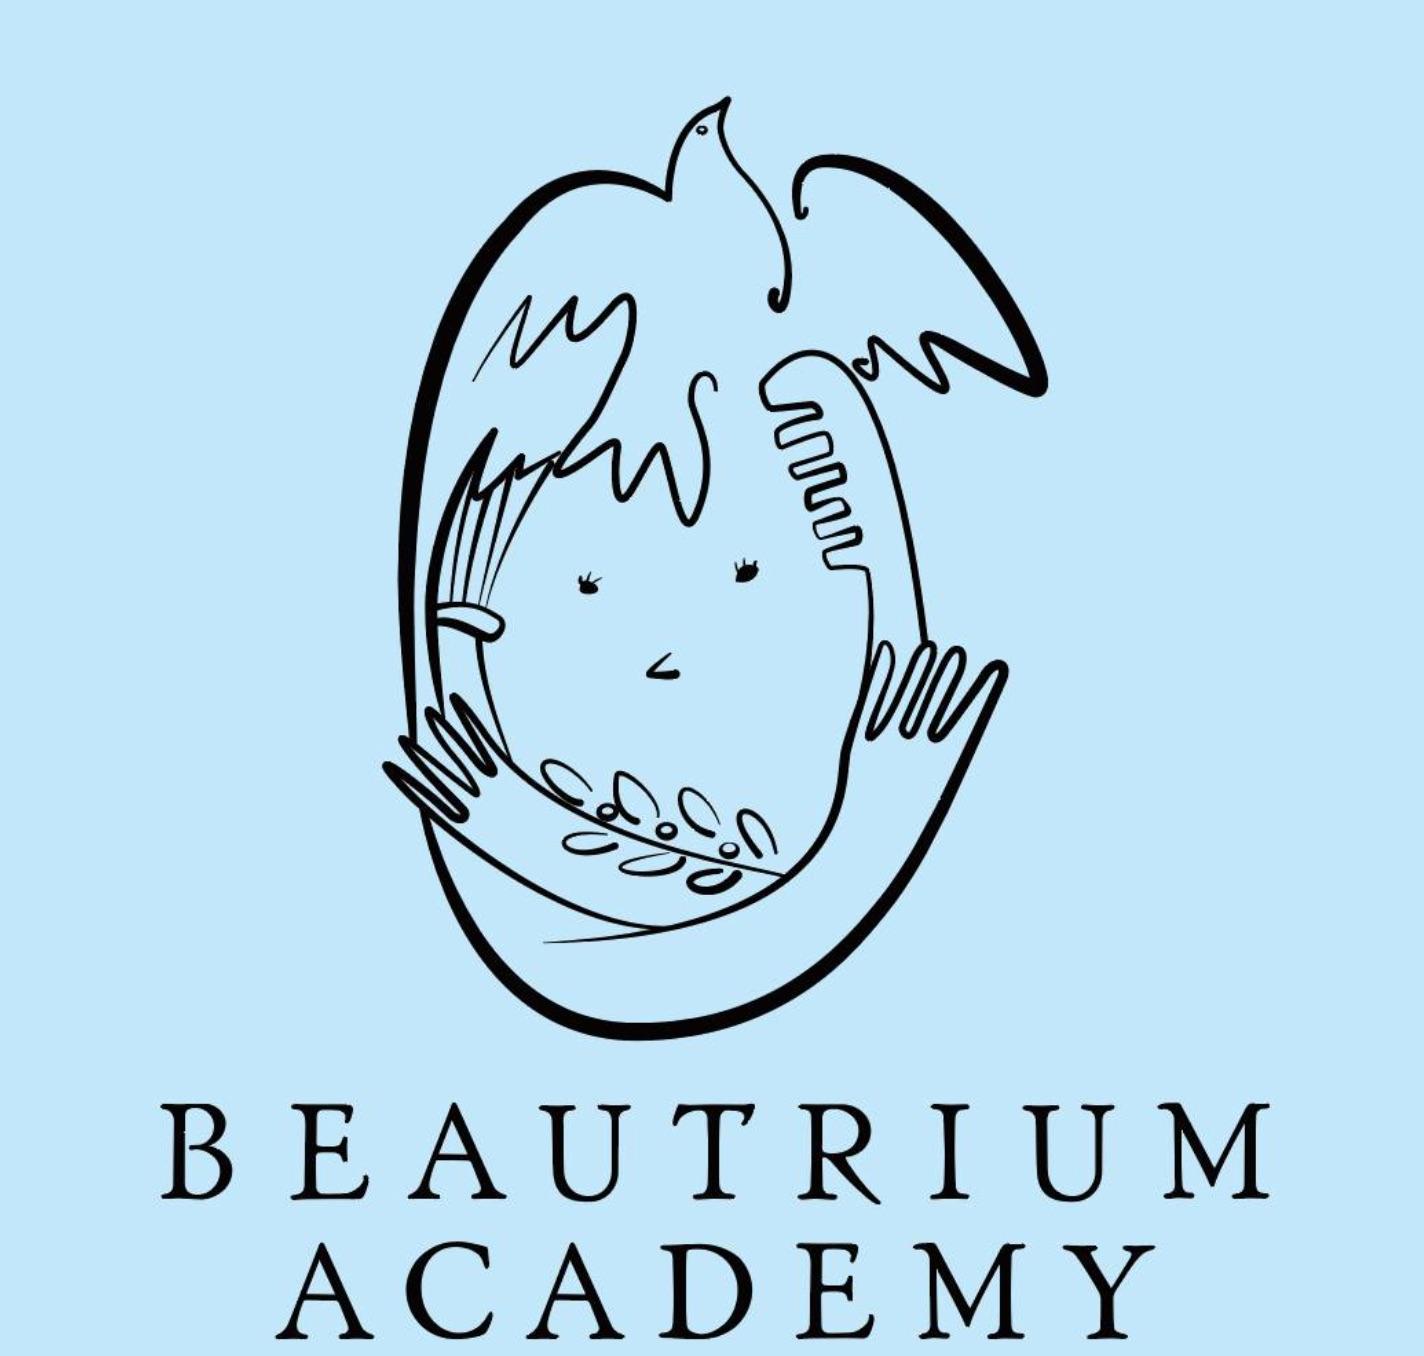 beautrium_academy.jpg